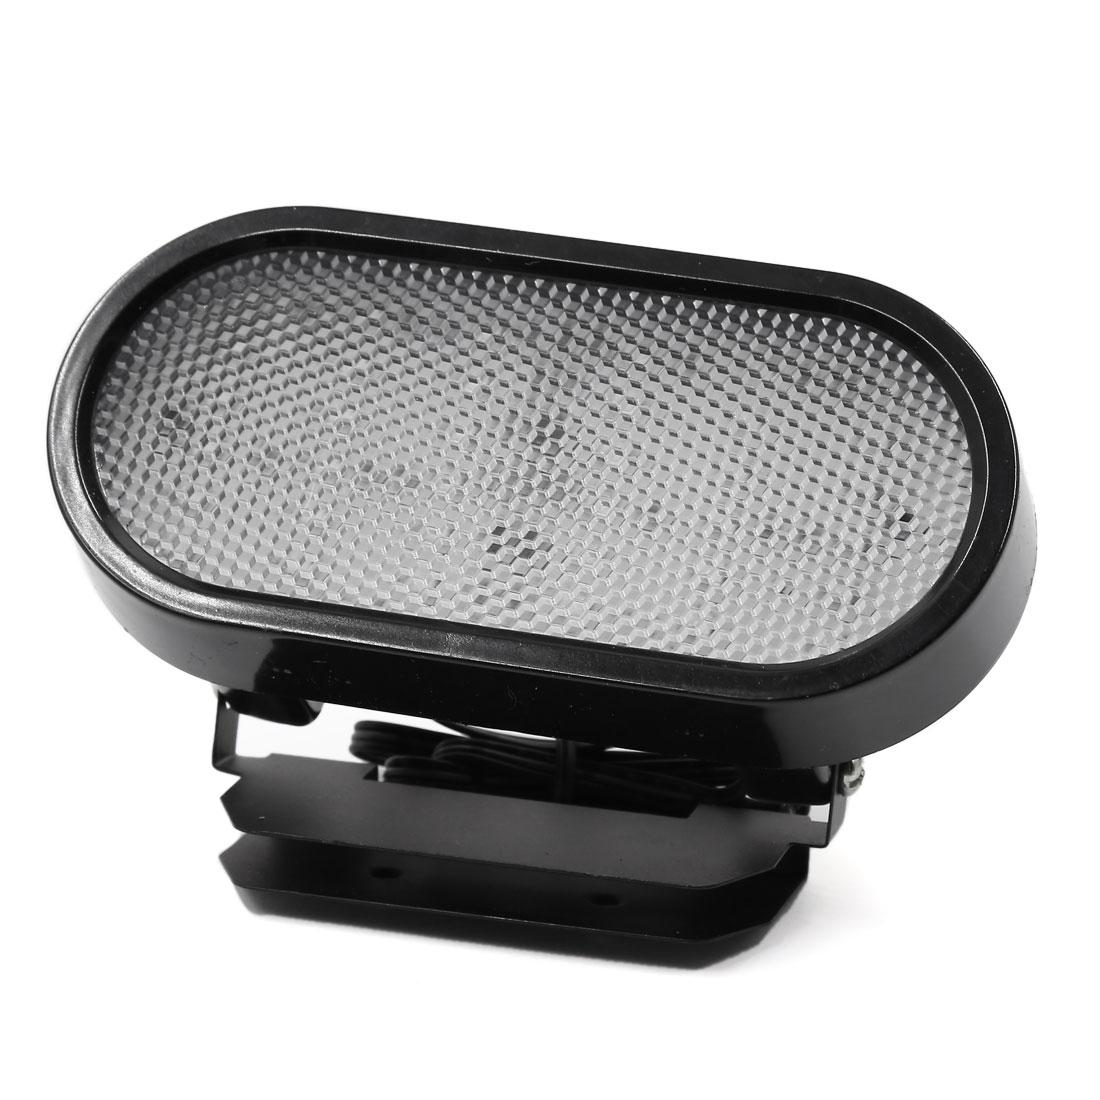 Waterproof Black Plastic Shell Red LED Car Tail Brake Light Stop Parking Lamp